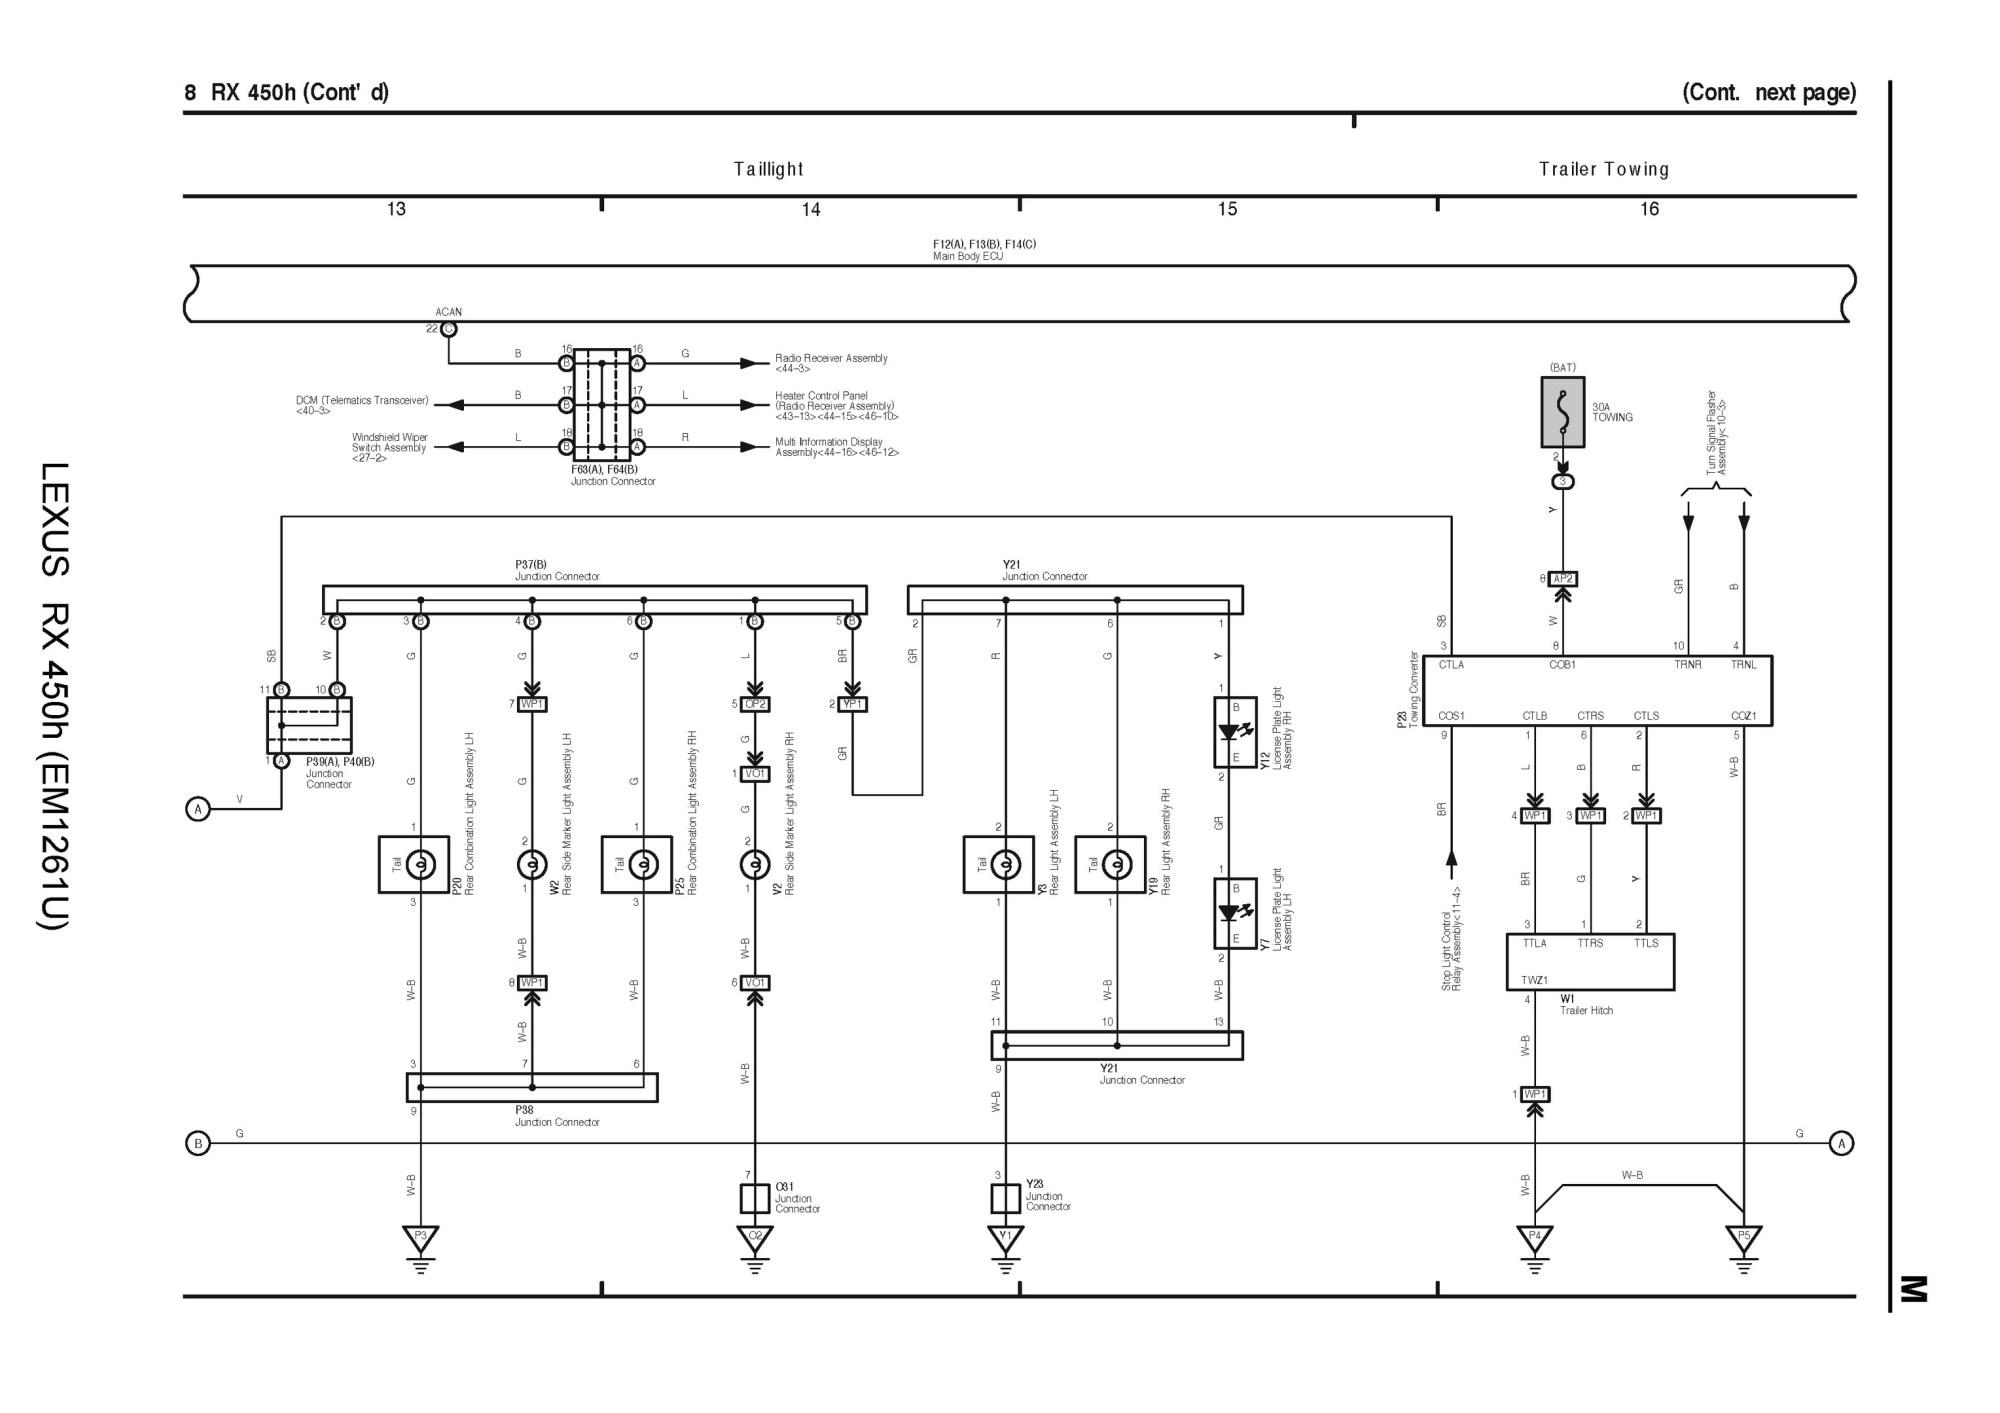 hight resolution of lexus rx 450h wiring diagram wiring diagram 2009 lexus rx 350 wiring diagram lexus rx wiring diagram